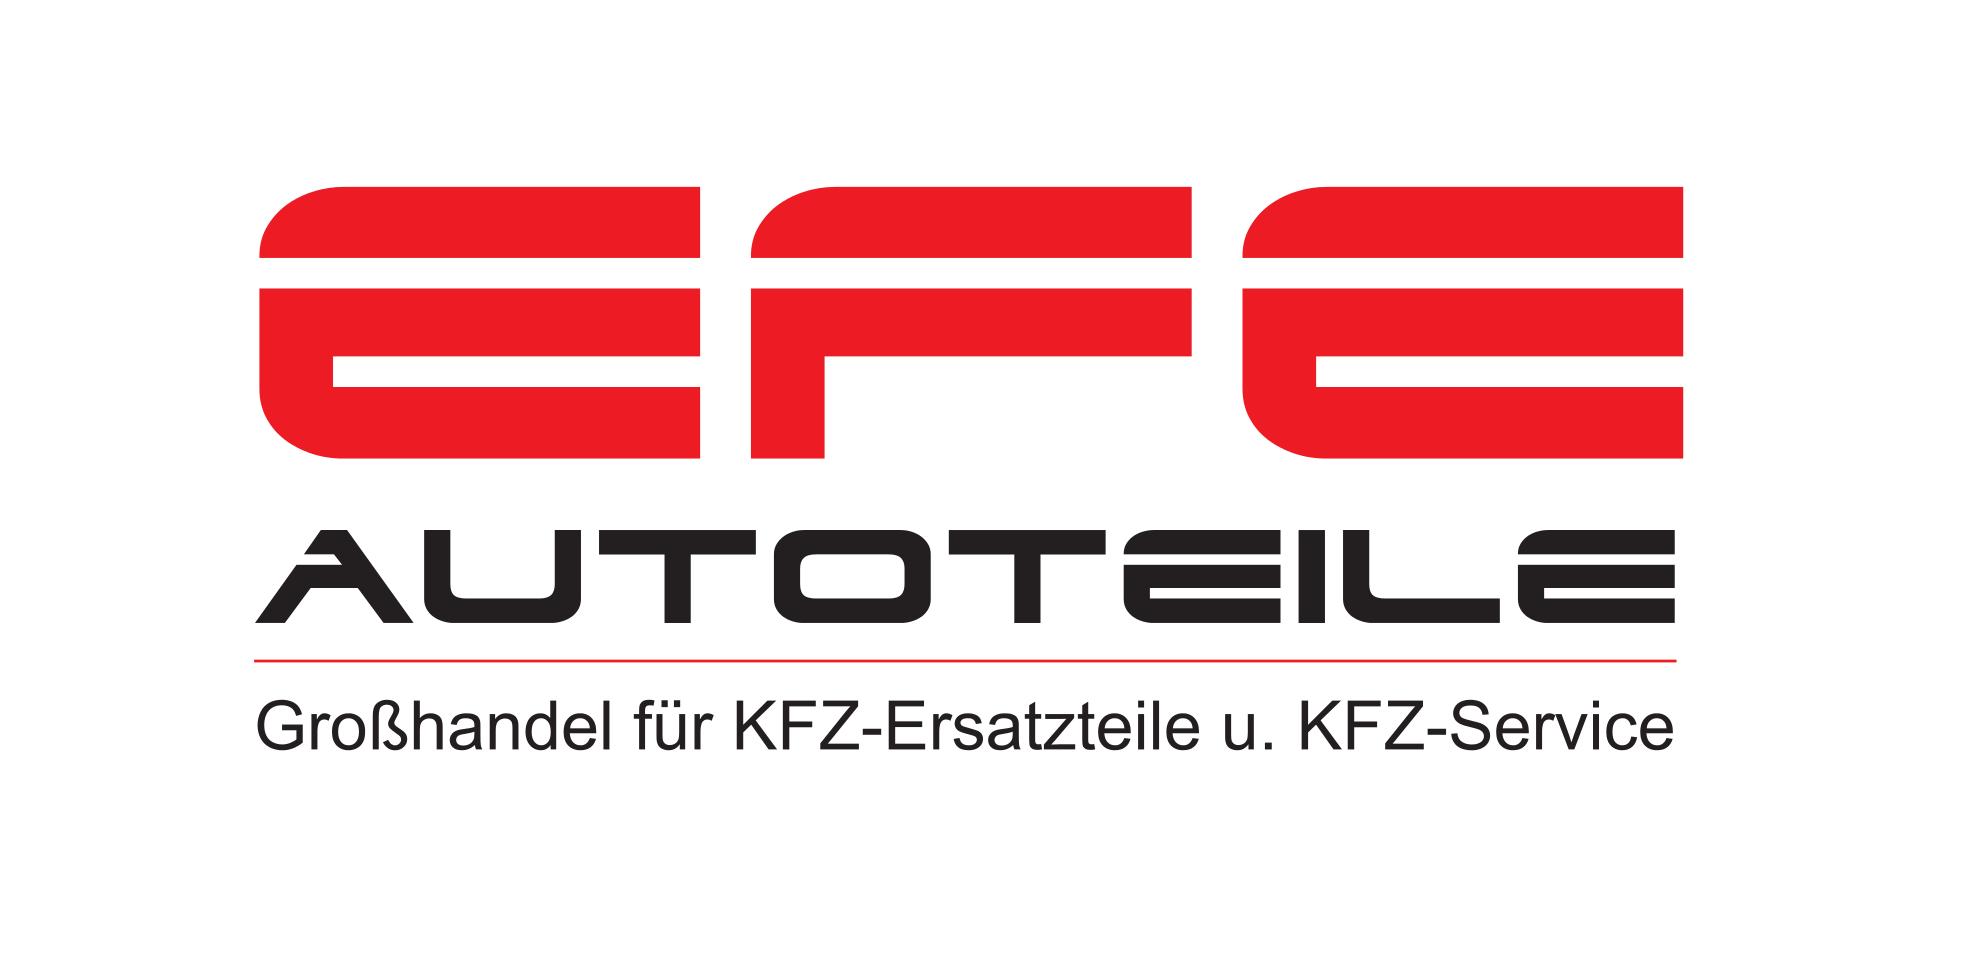 EFE Autototeile